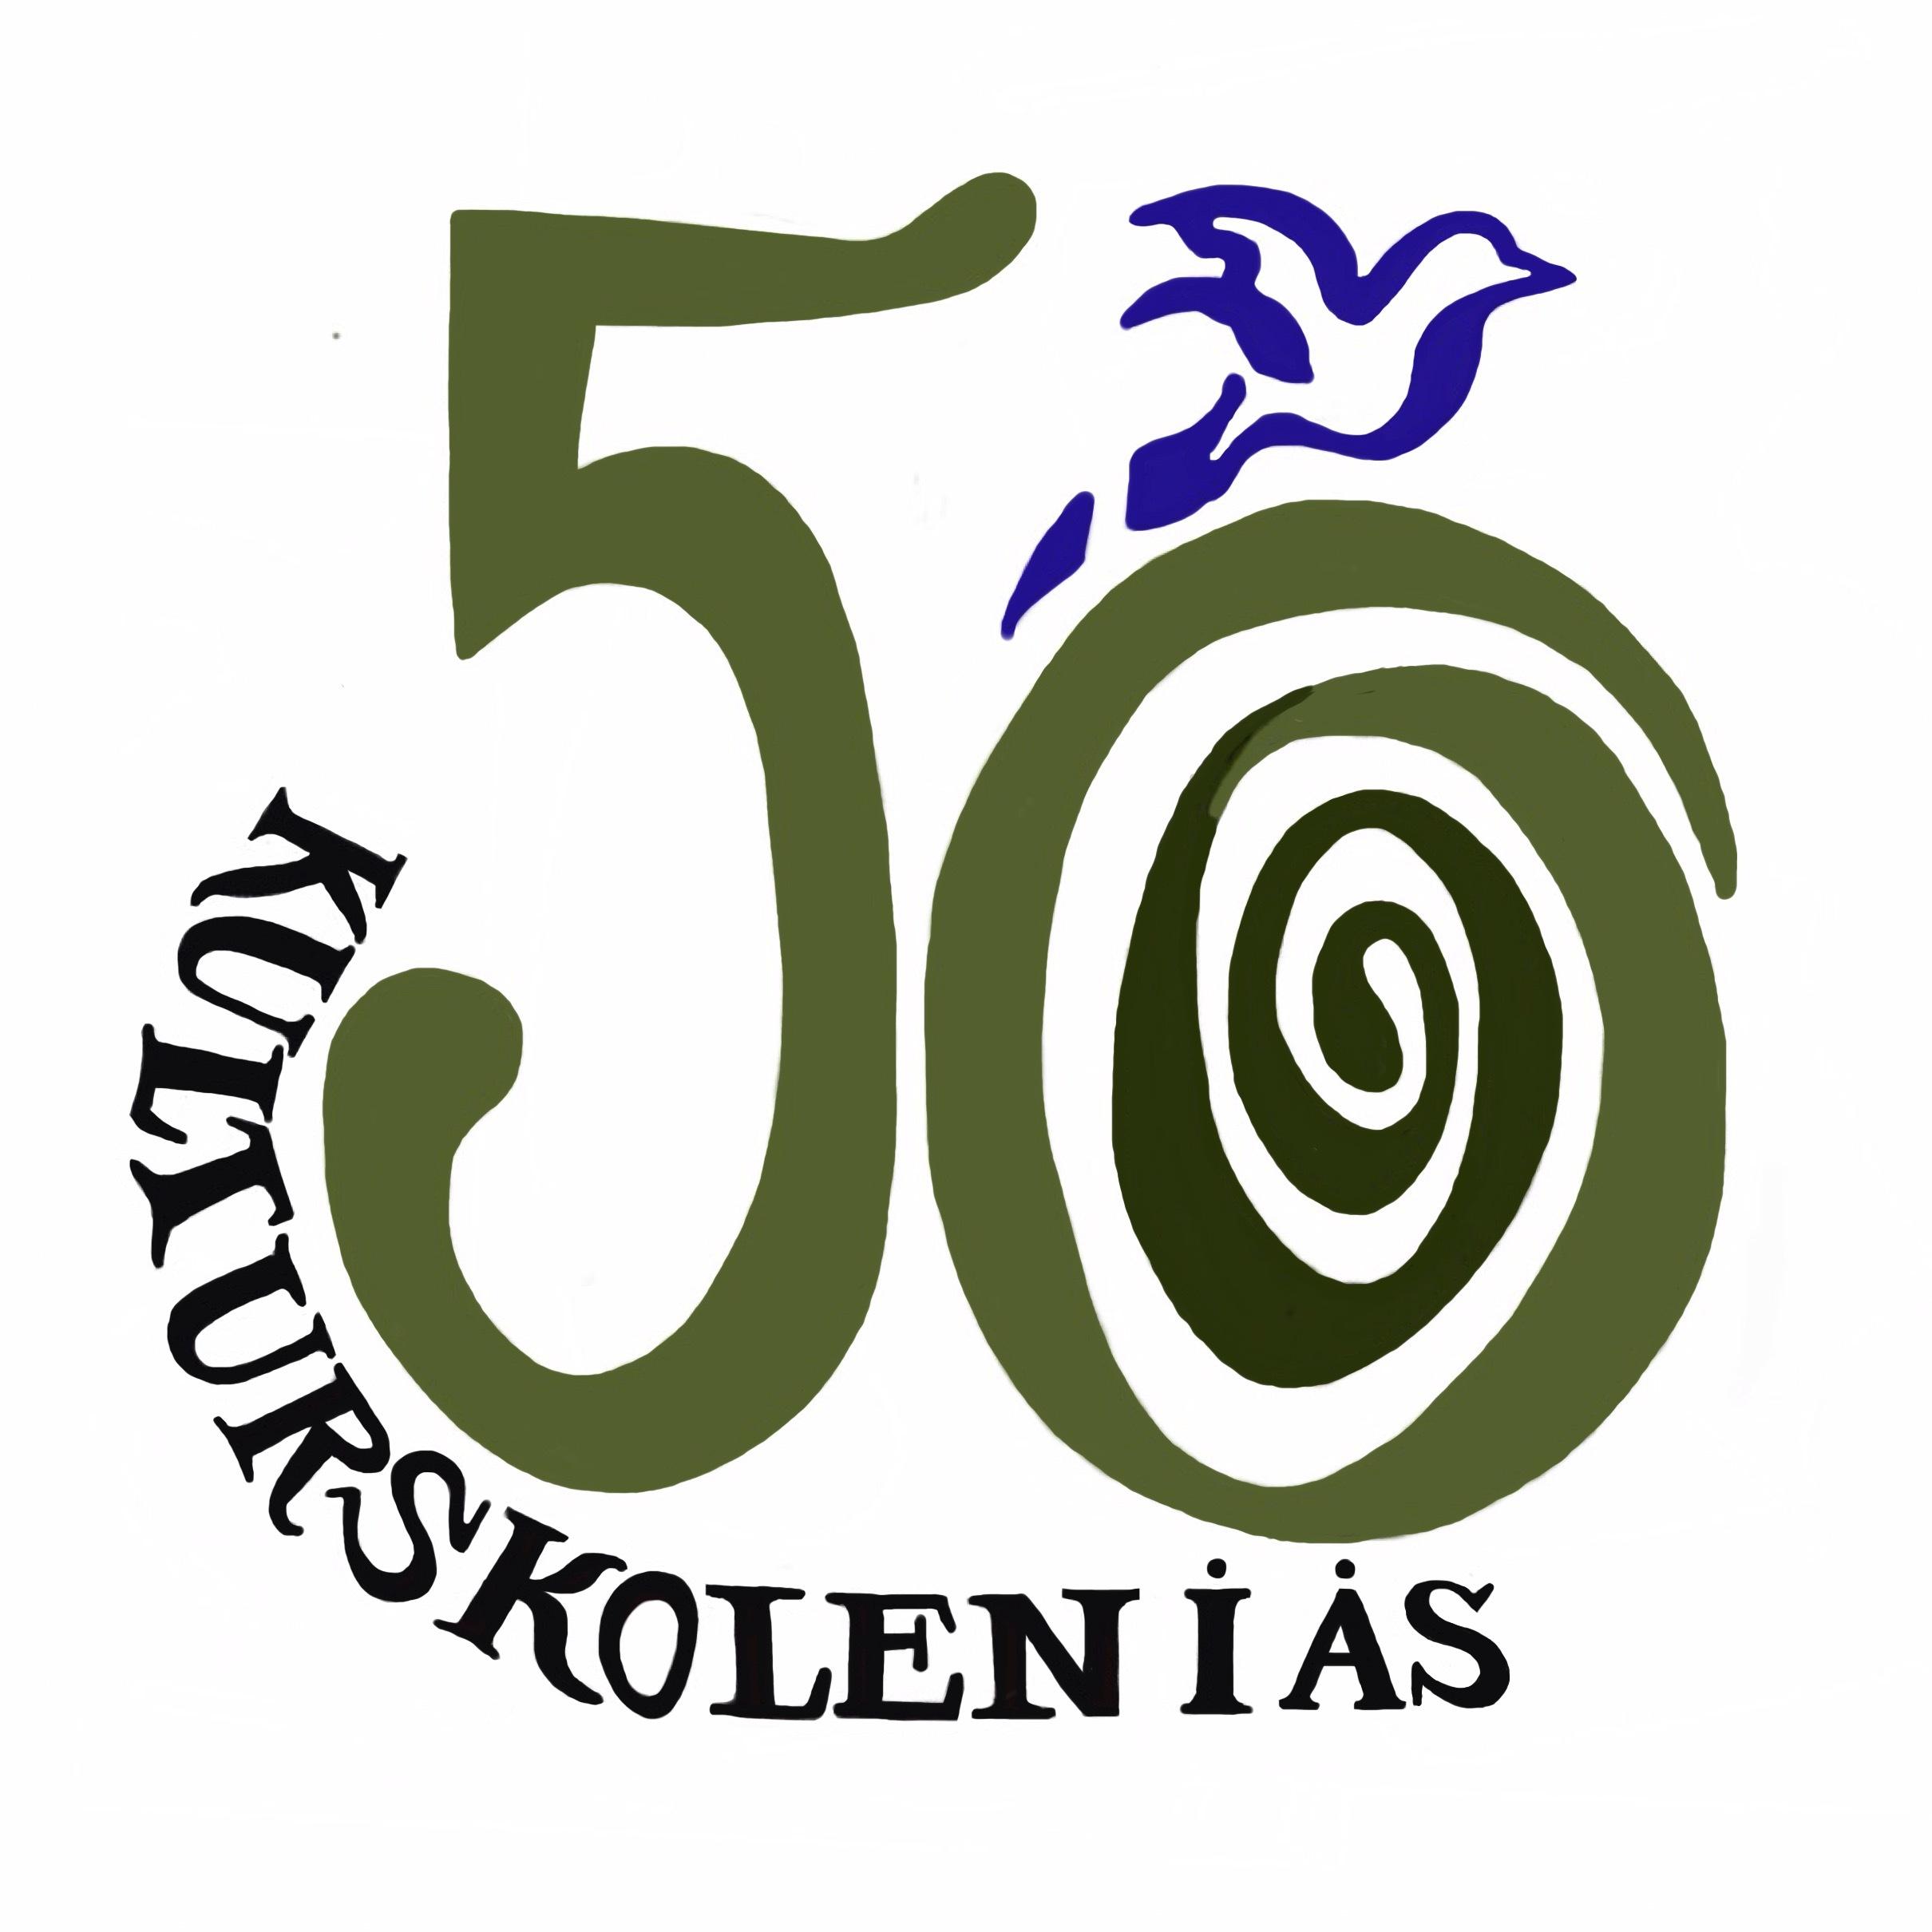 logo 50 år